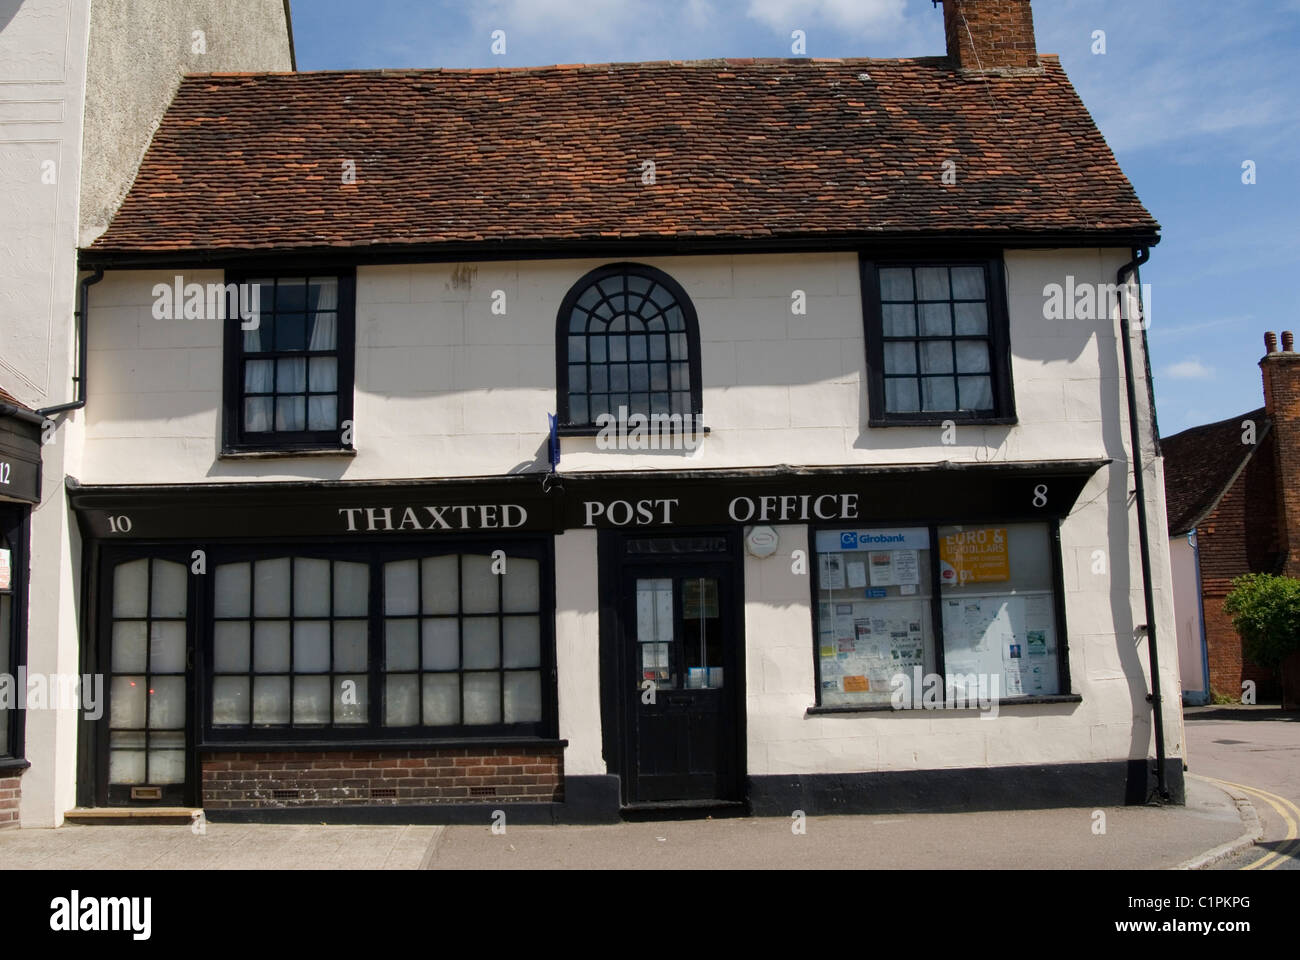 L'Angleterre, Essex, Thaxted, façade du bureau de poste Photo Stock